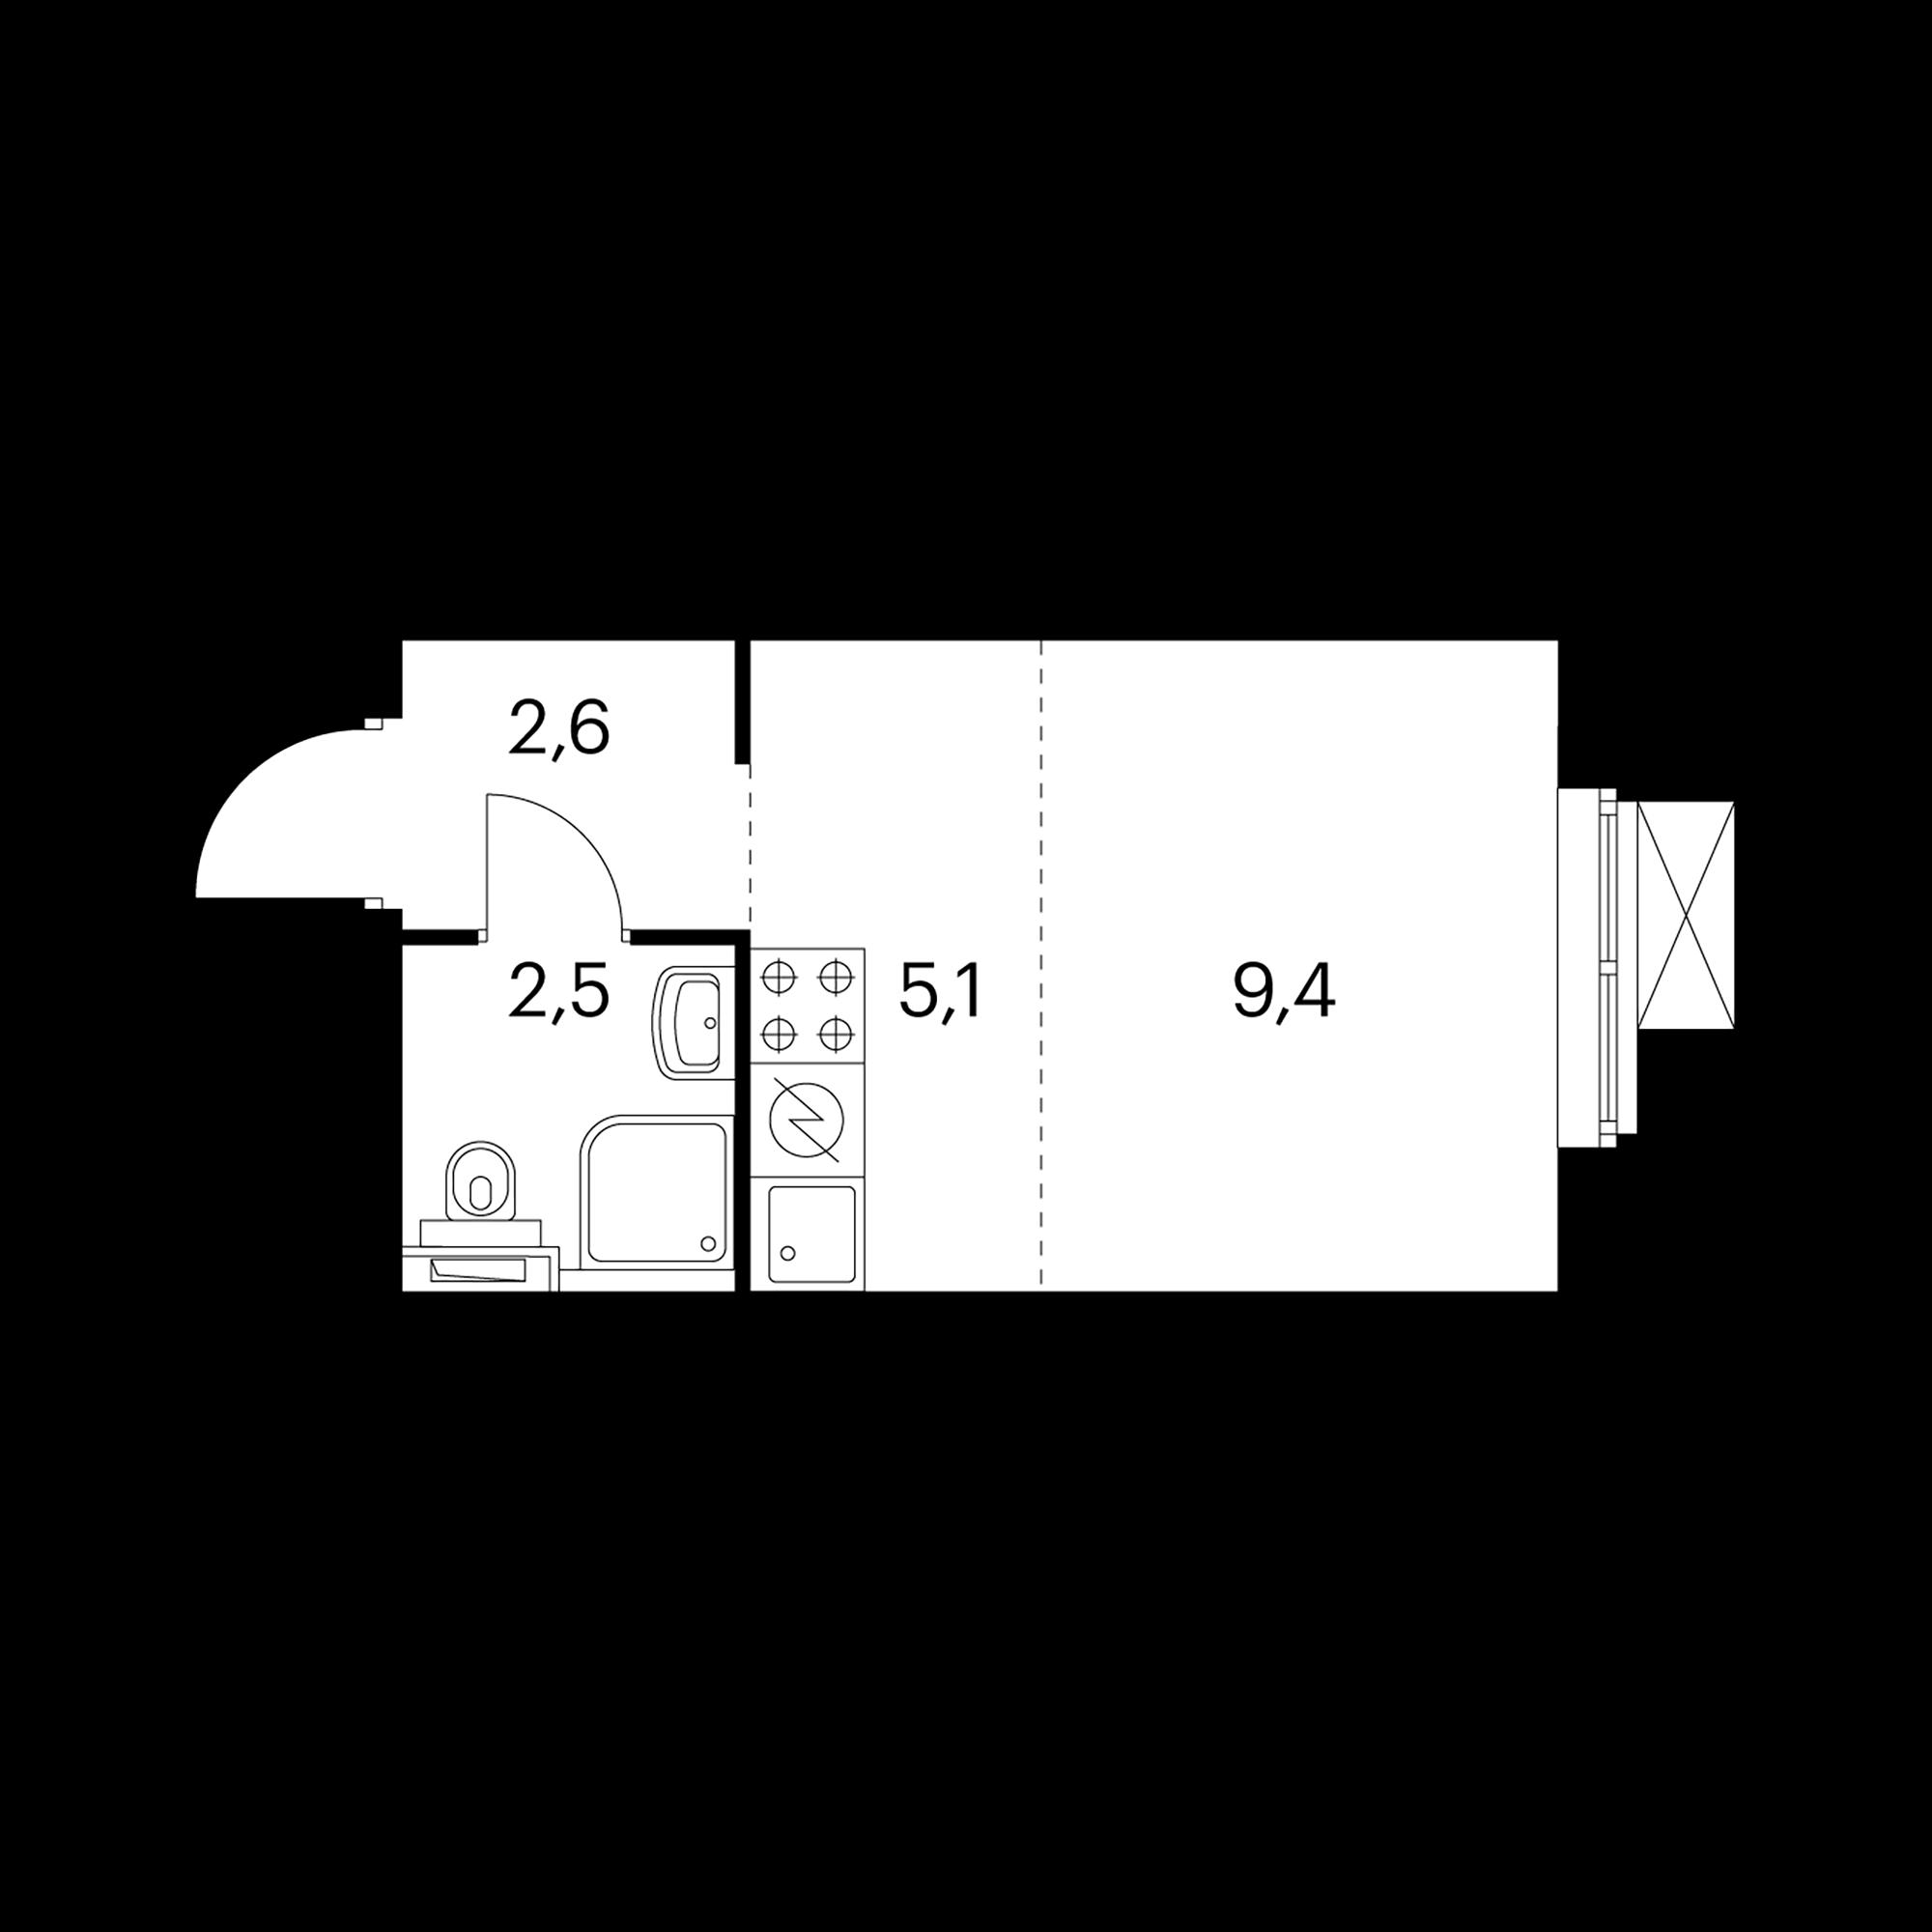 1NS1_3.6-4